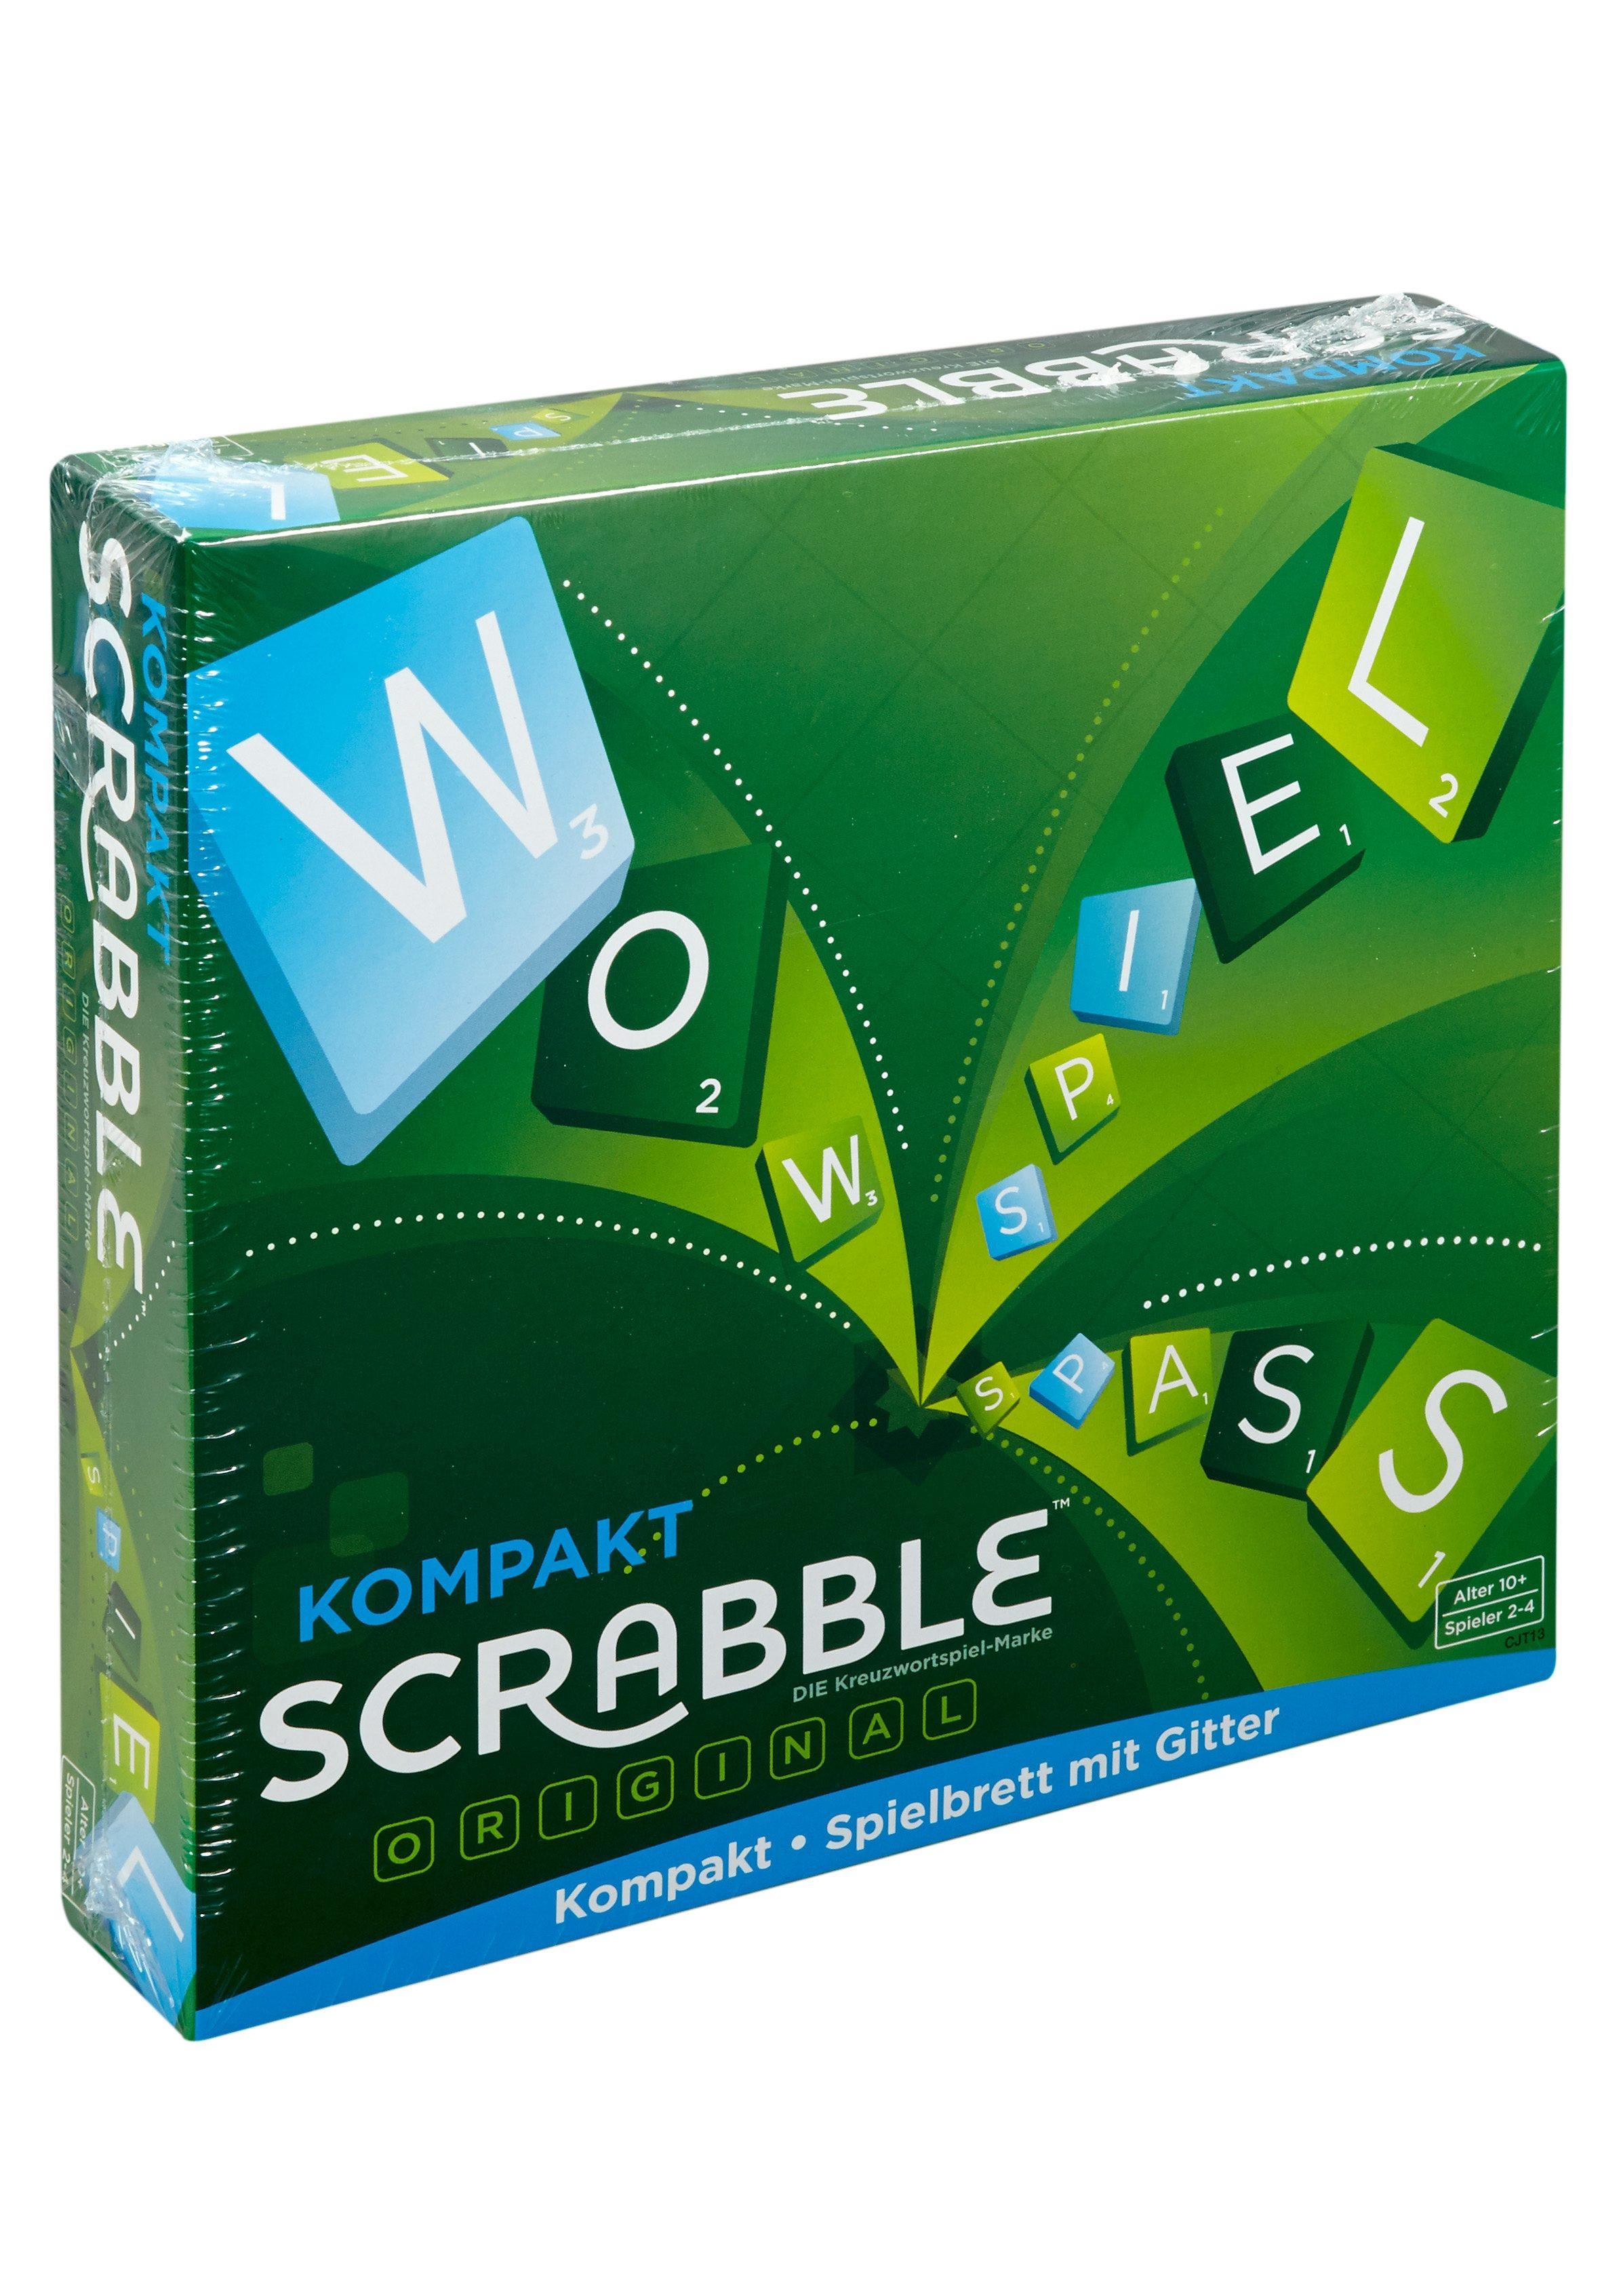 Mattel Spiel, Gesellschaftsspiel - Scrabble Kompakt bunt Kinder Denkspiele Gesellschaftsspiele Spiele